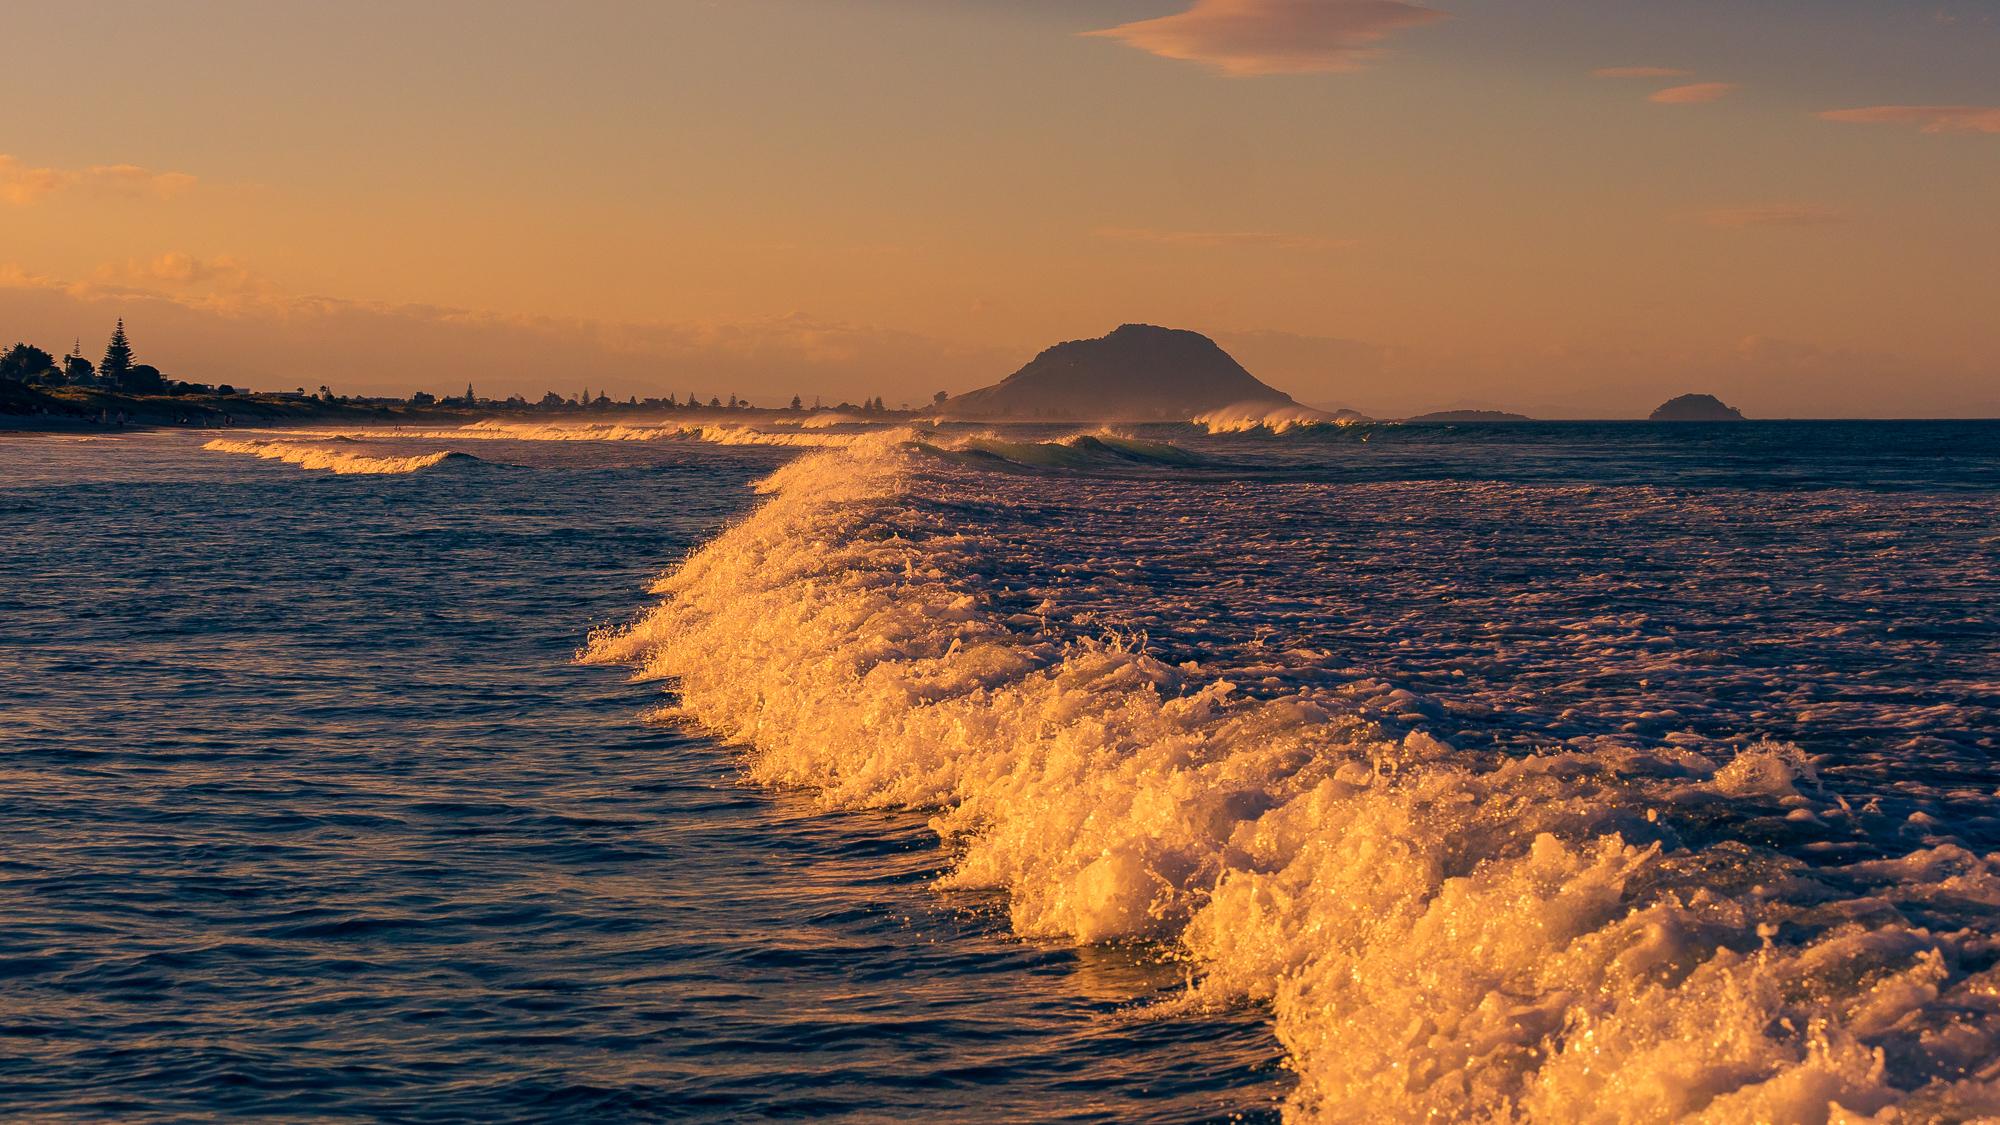 Summer evening. Incoming tide. Papamoa Beach. P1070055